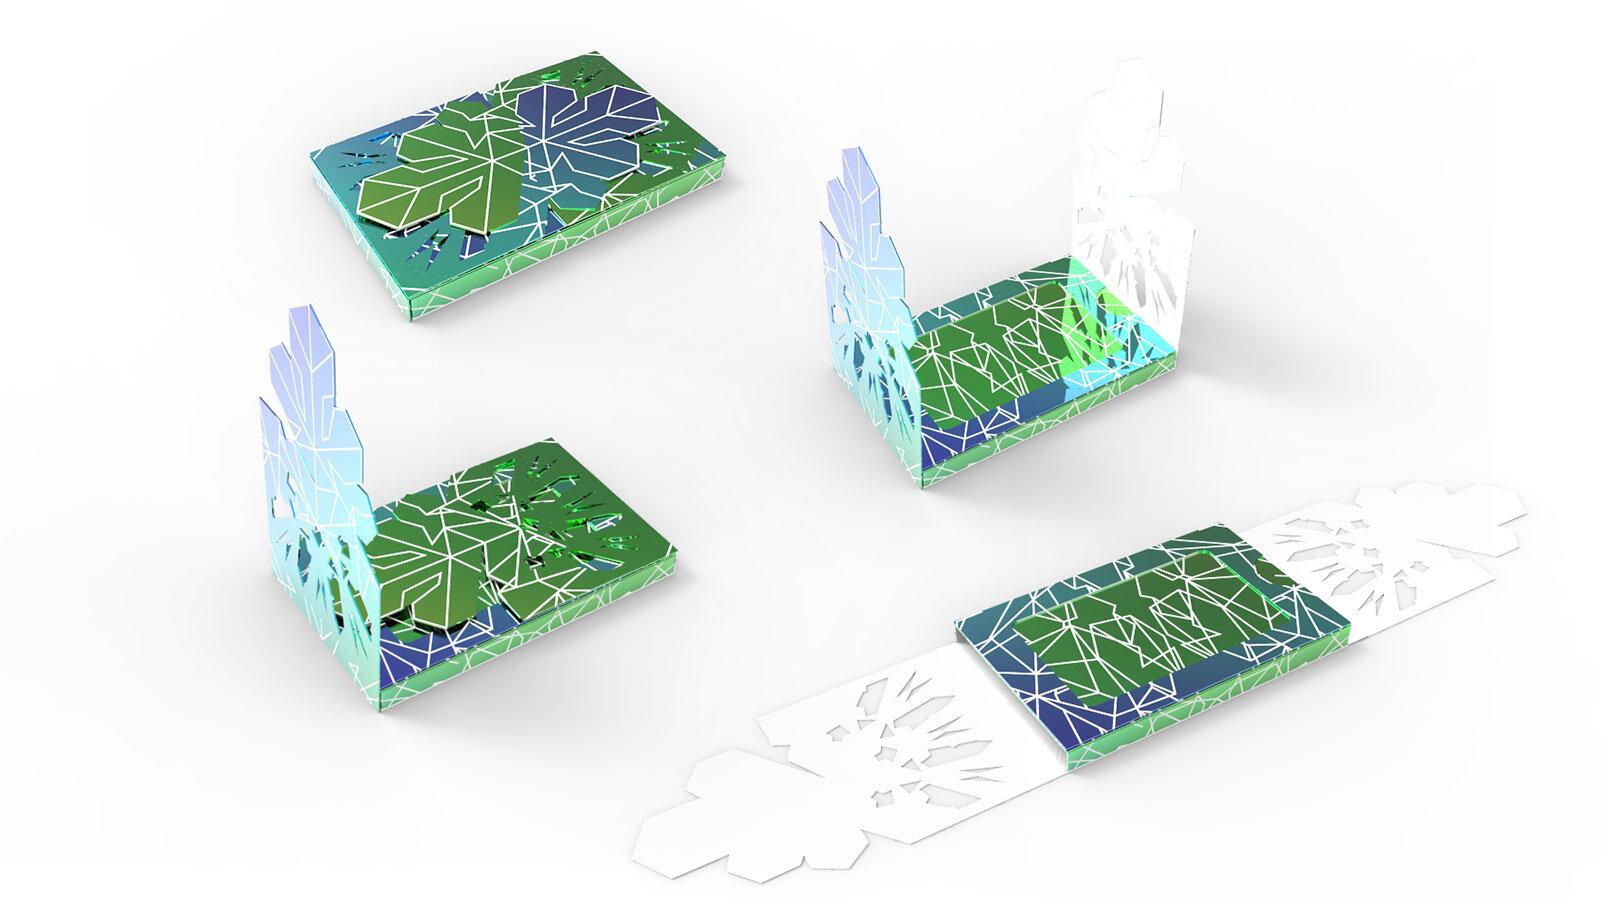 Sephora-snowflake-holiday-gift-card-packaging-company-design-3.jpg